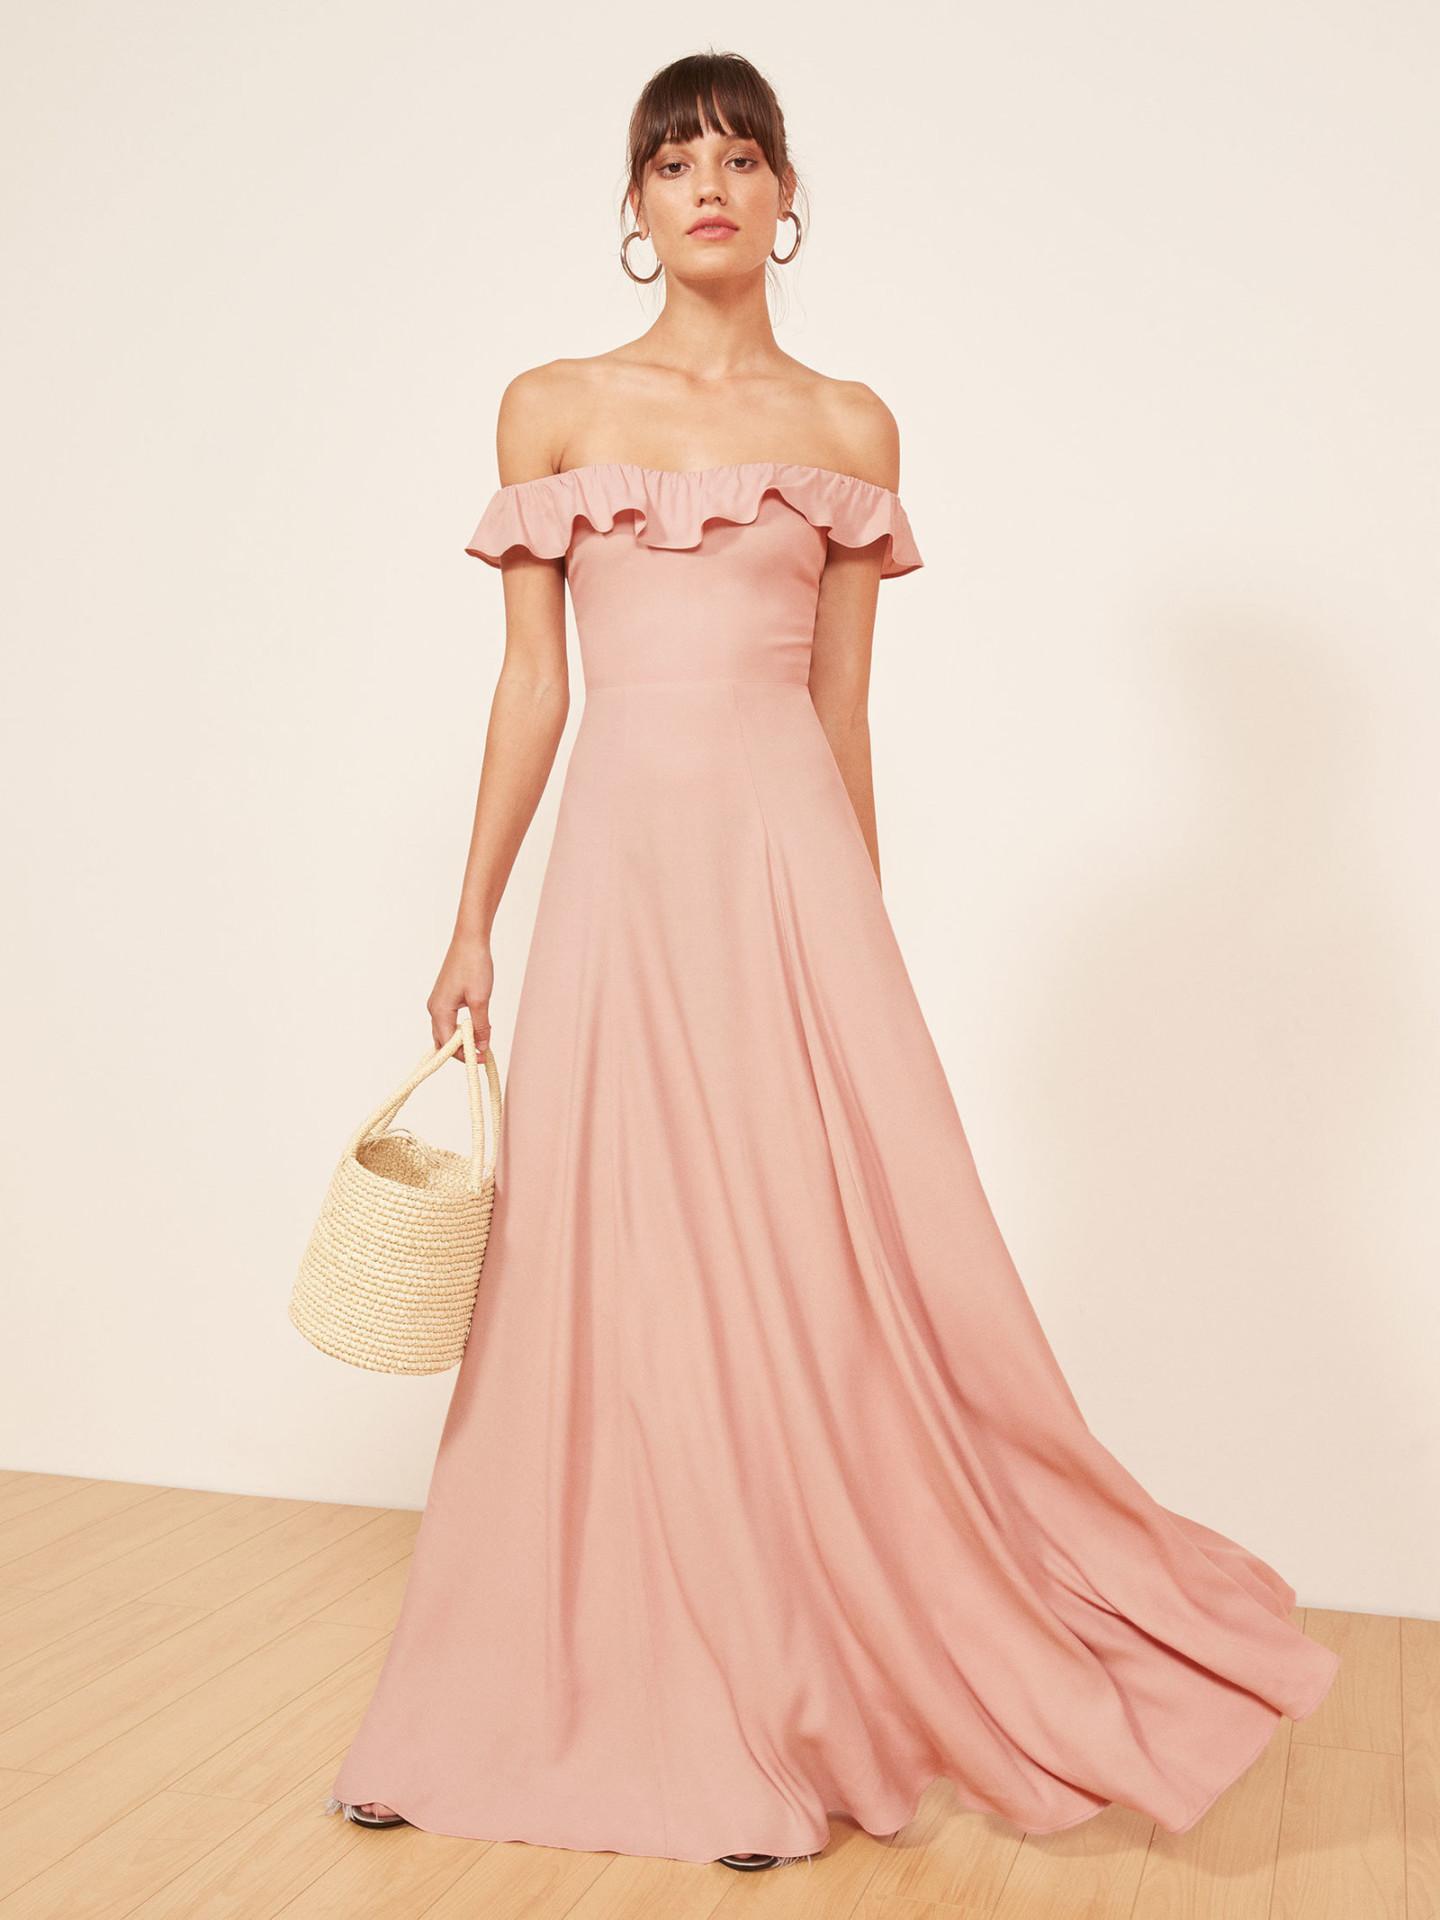 THEREFORMATION Verbena Blush Dress